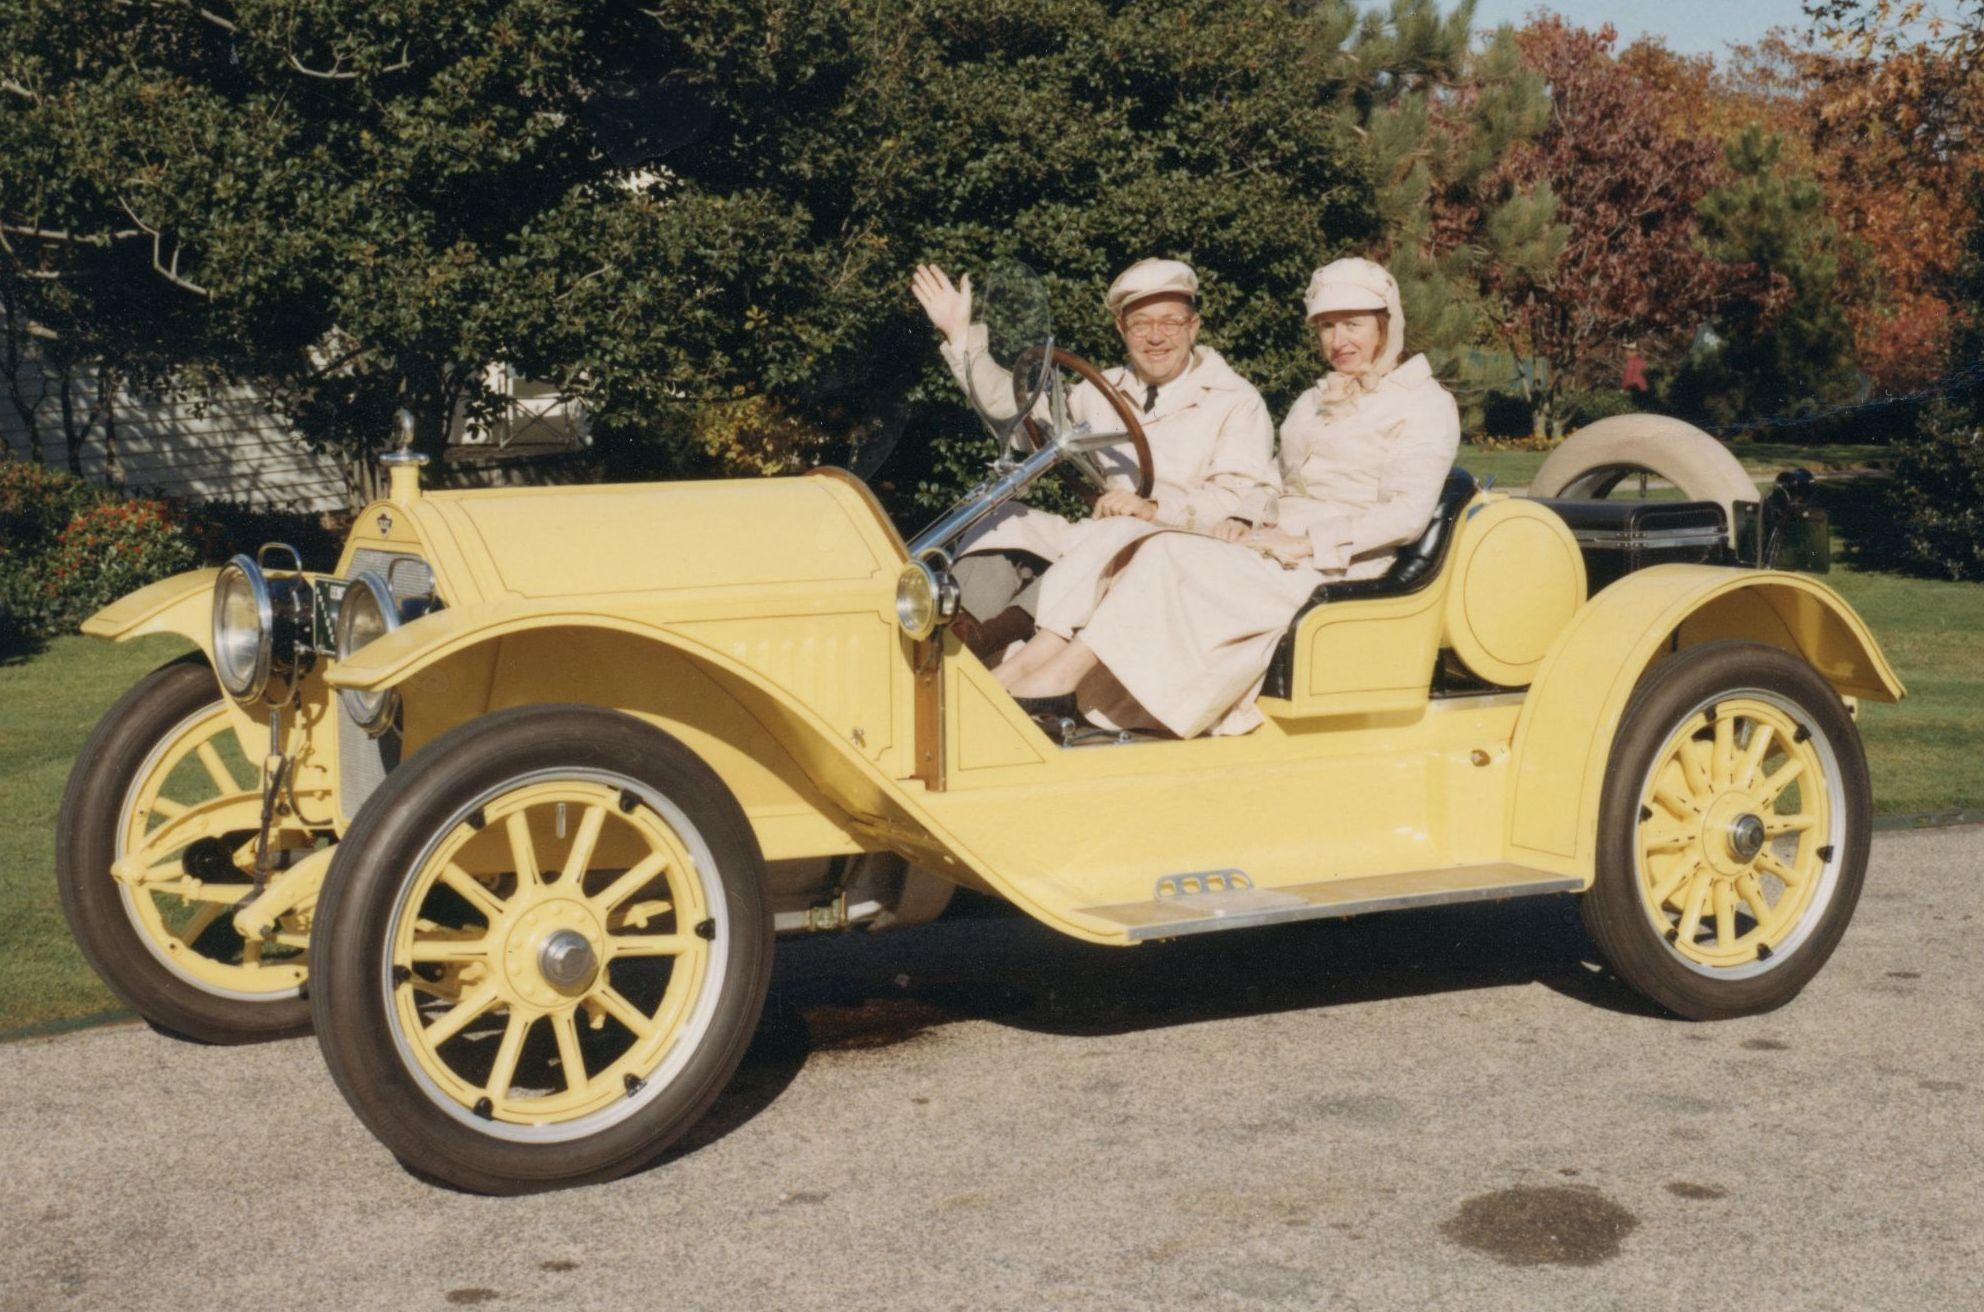 JK Lilly 1915 Stutz Bearcat